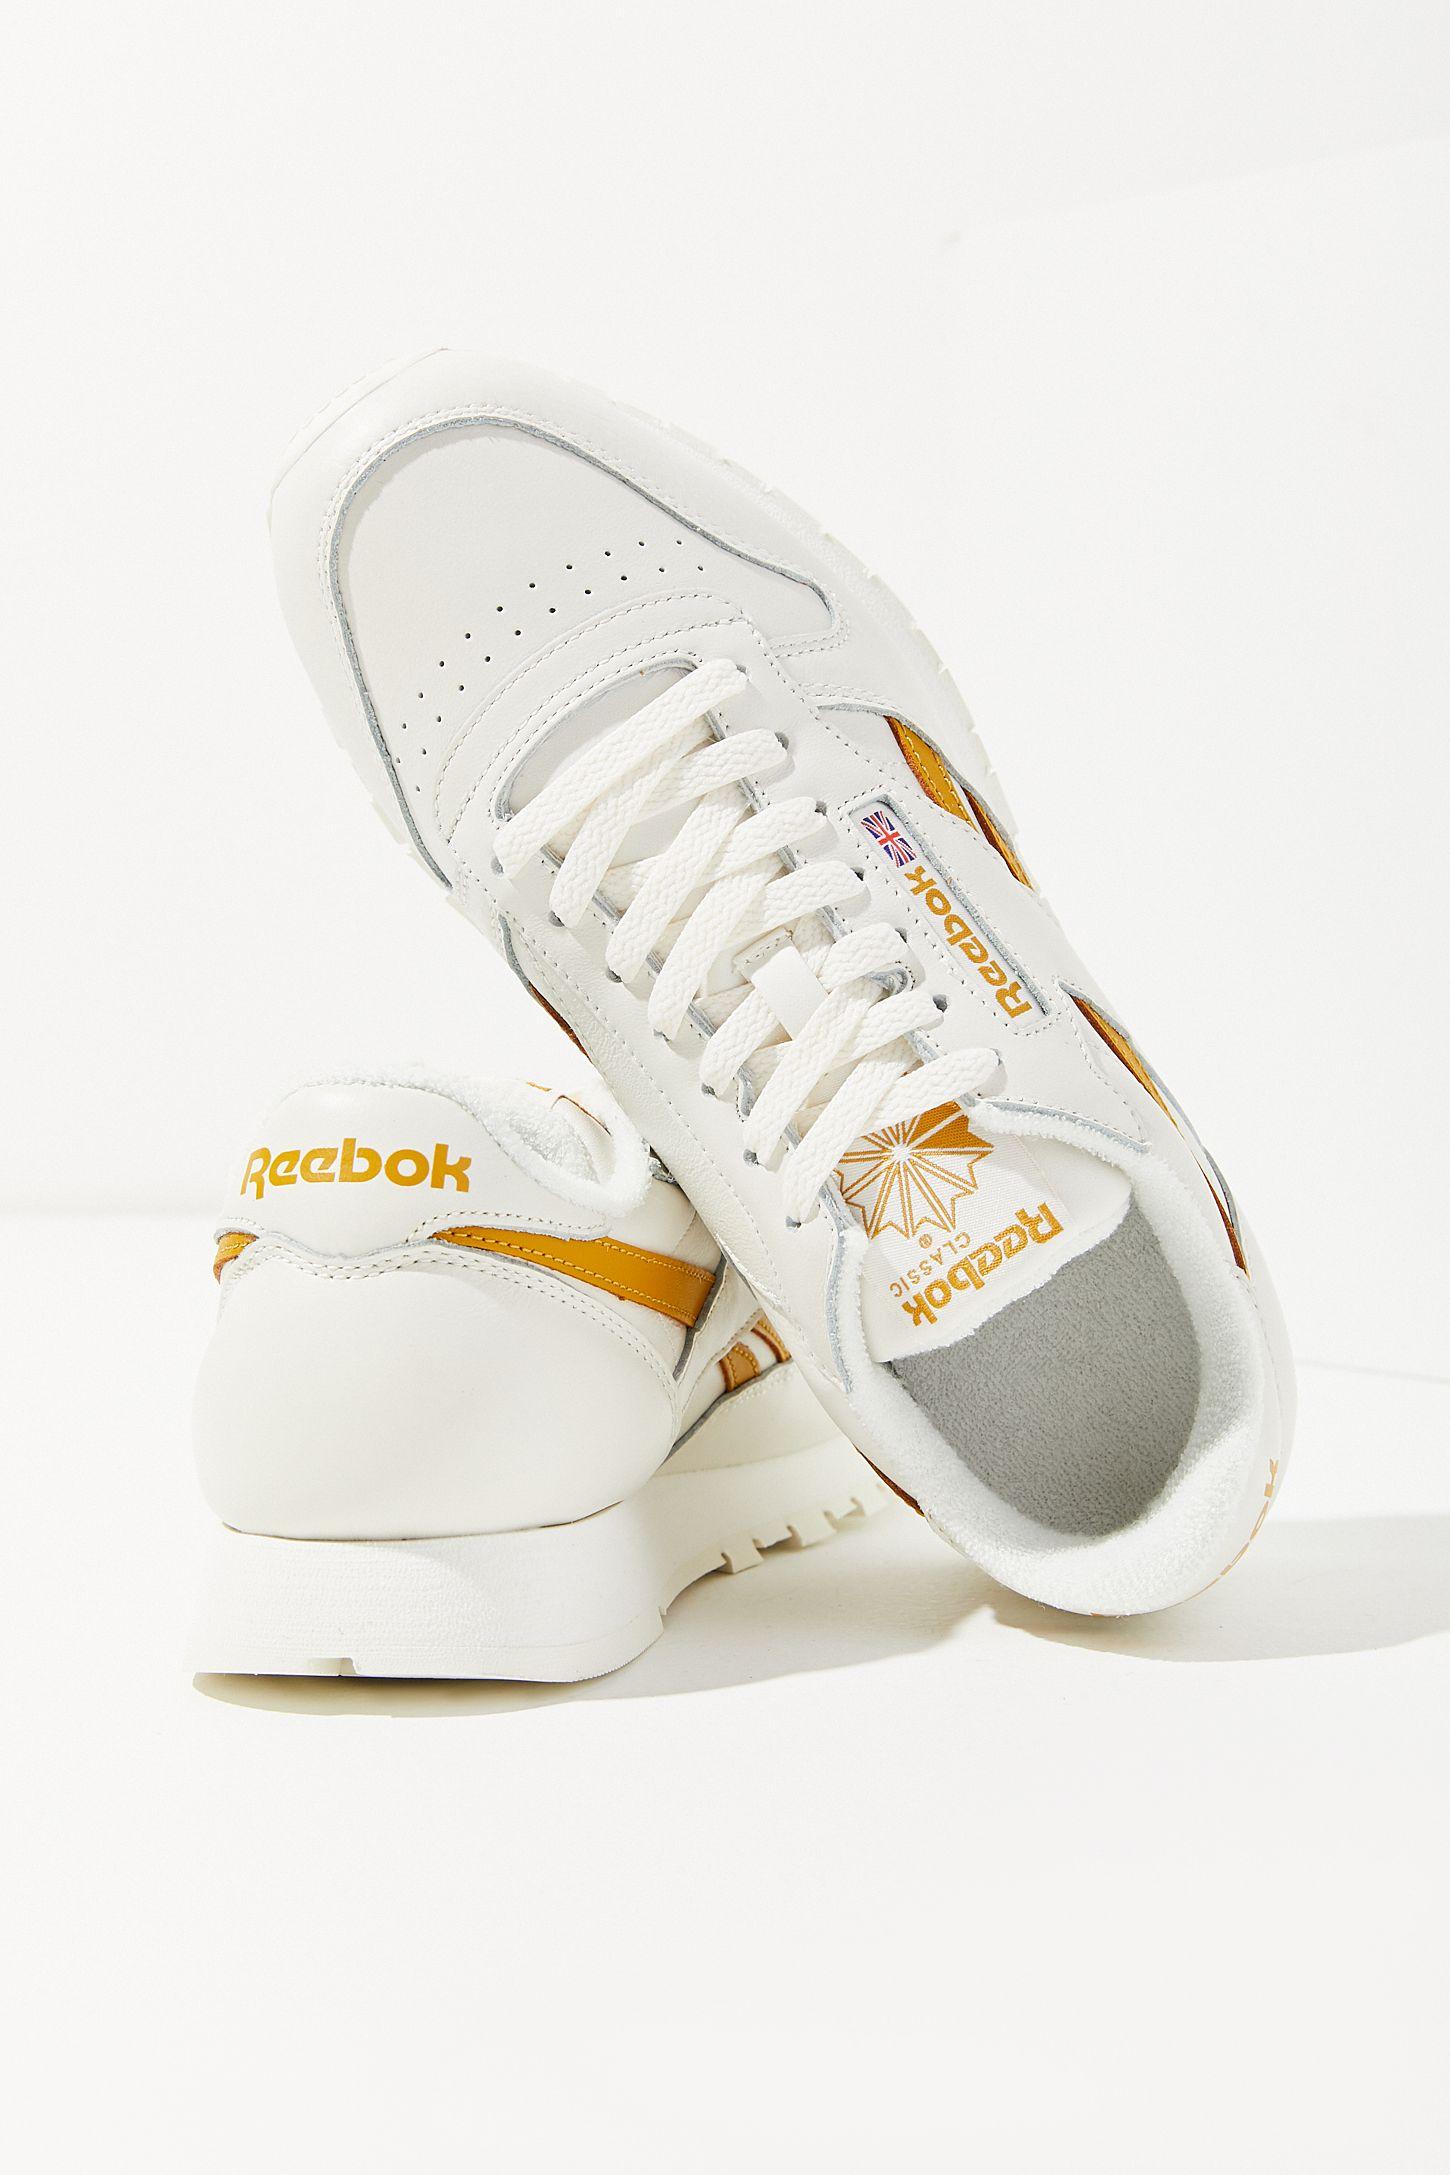 Sneaker Leather Vintage Reebok Classic Reebok OwZlkXiPuT